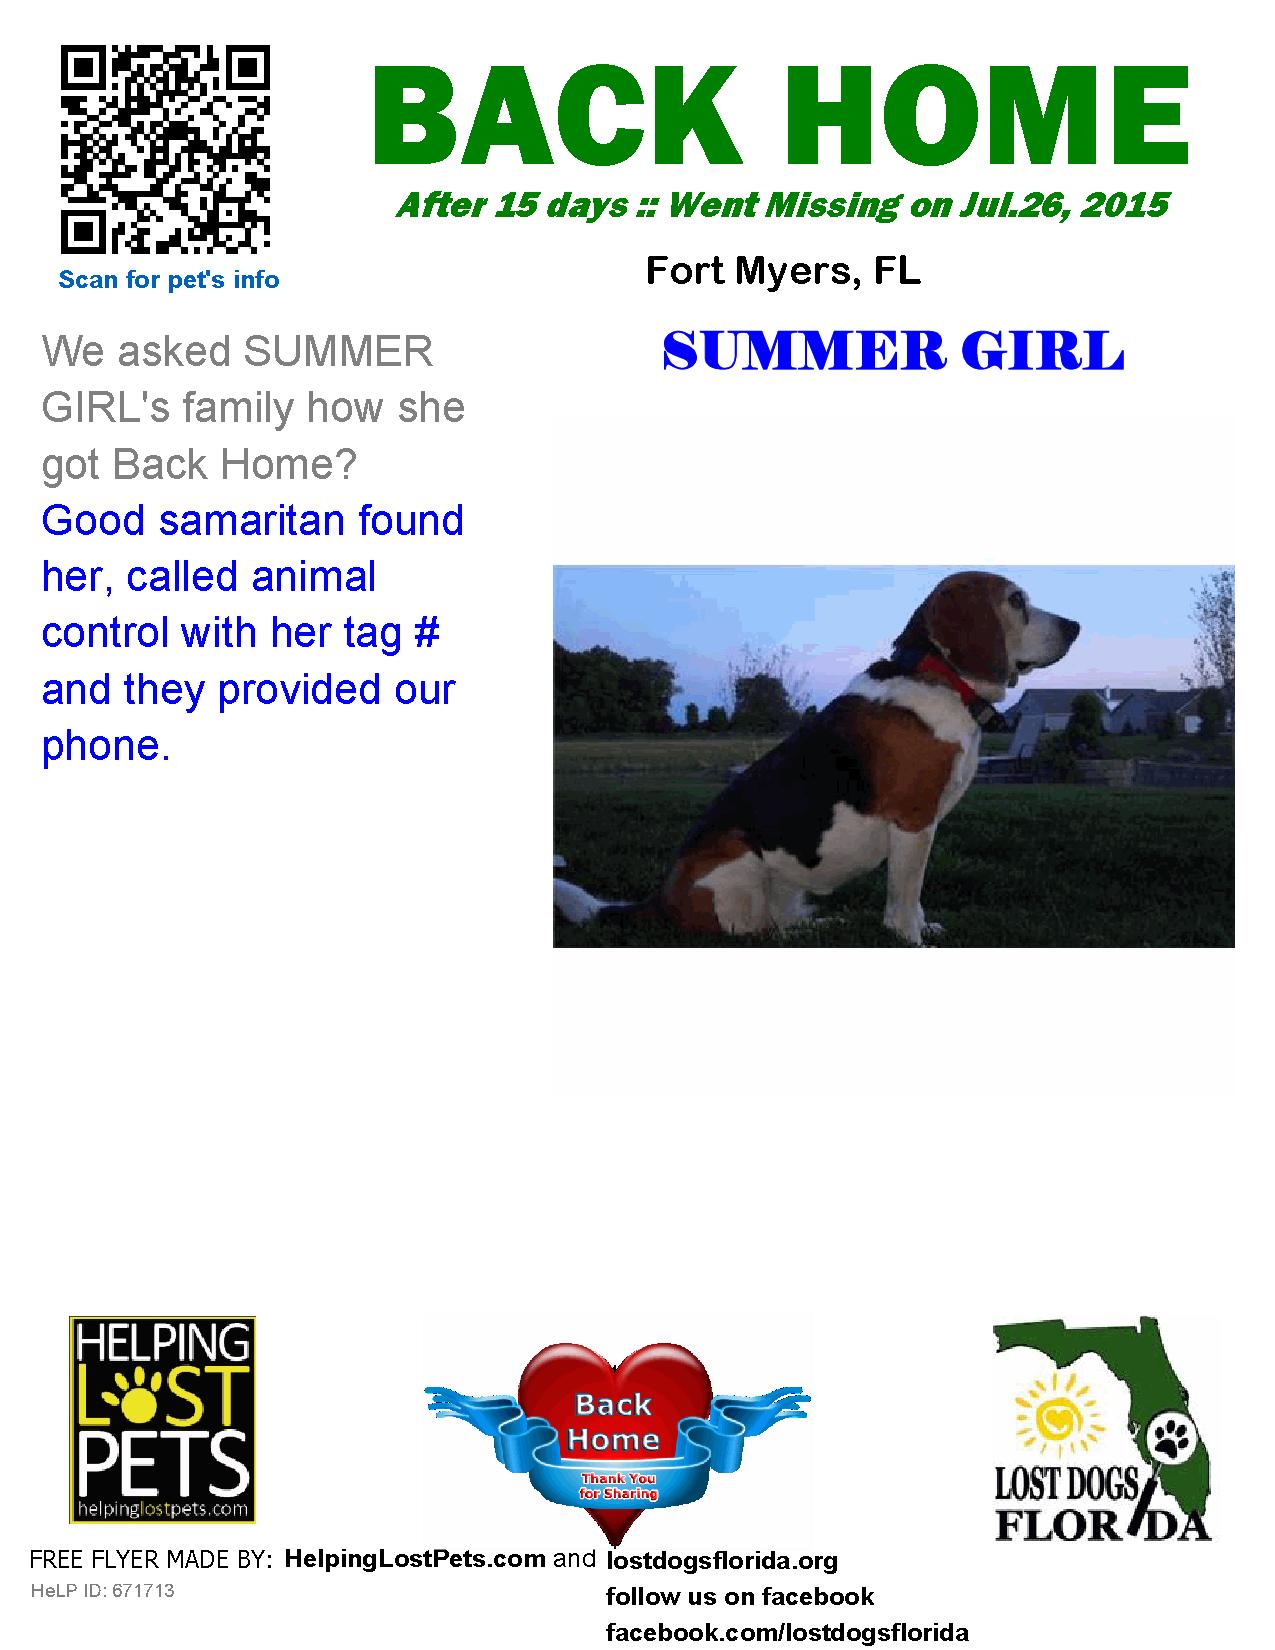 Craigslist Ft Myers Free Pets - Wayang Pets